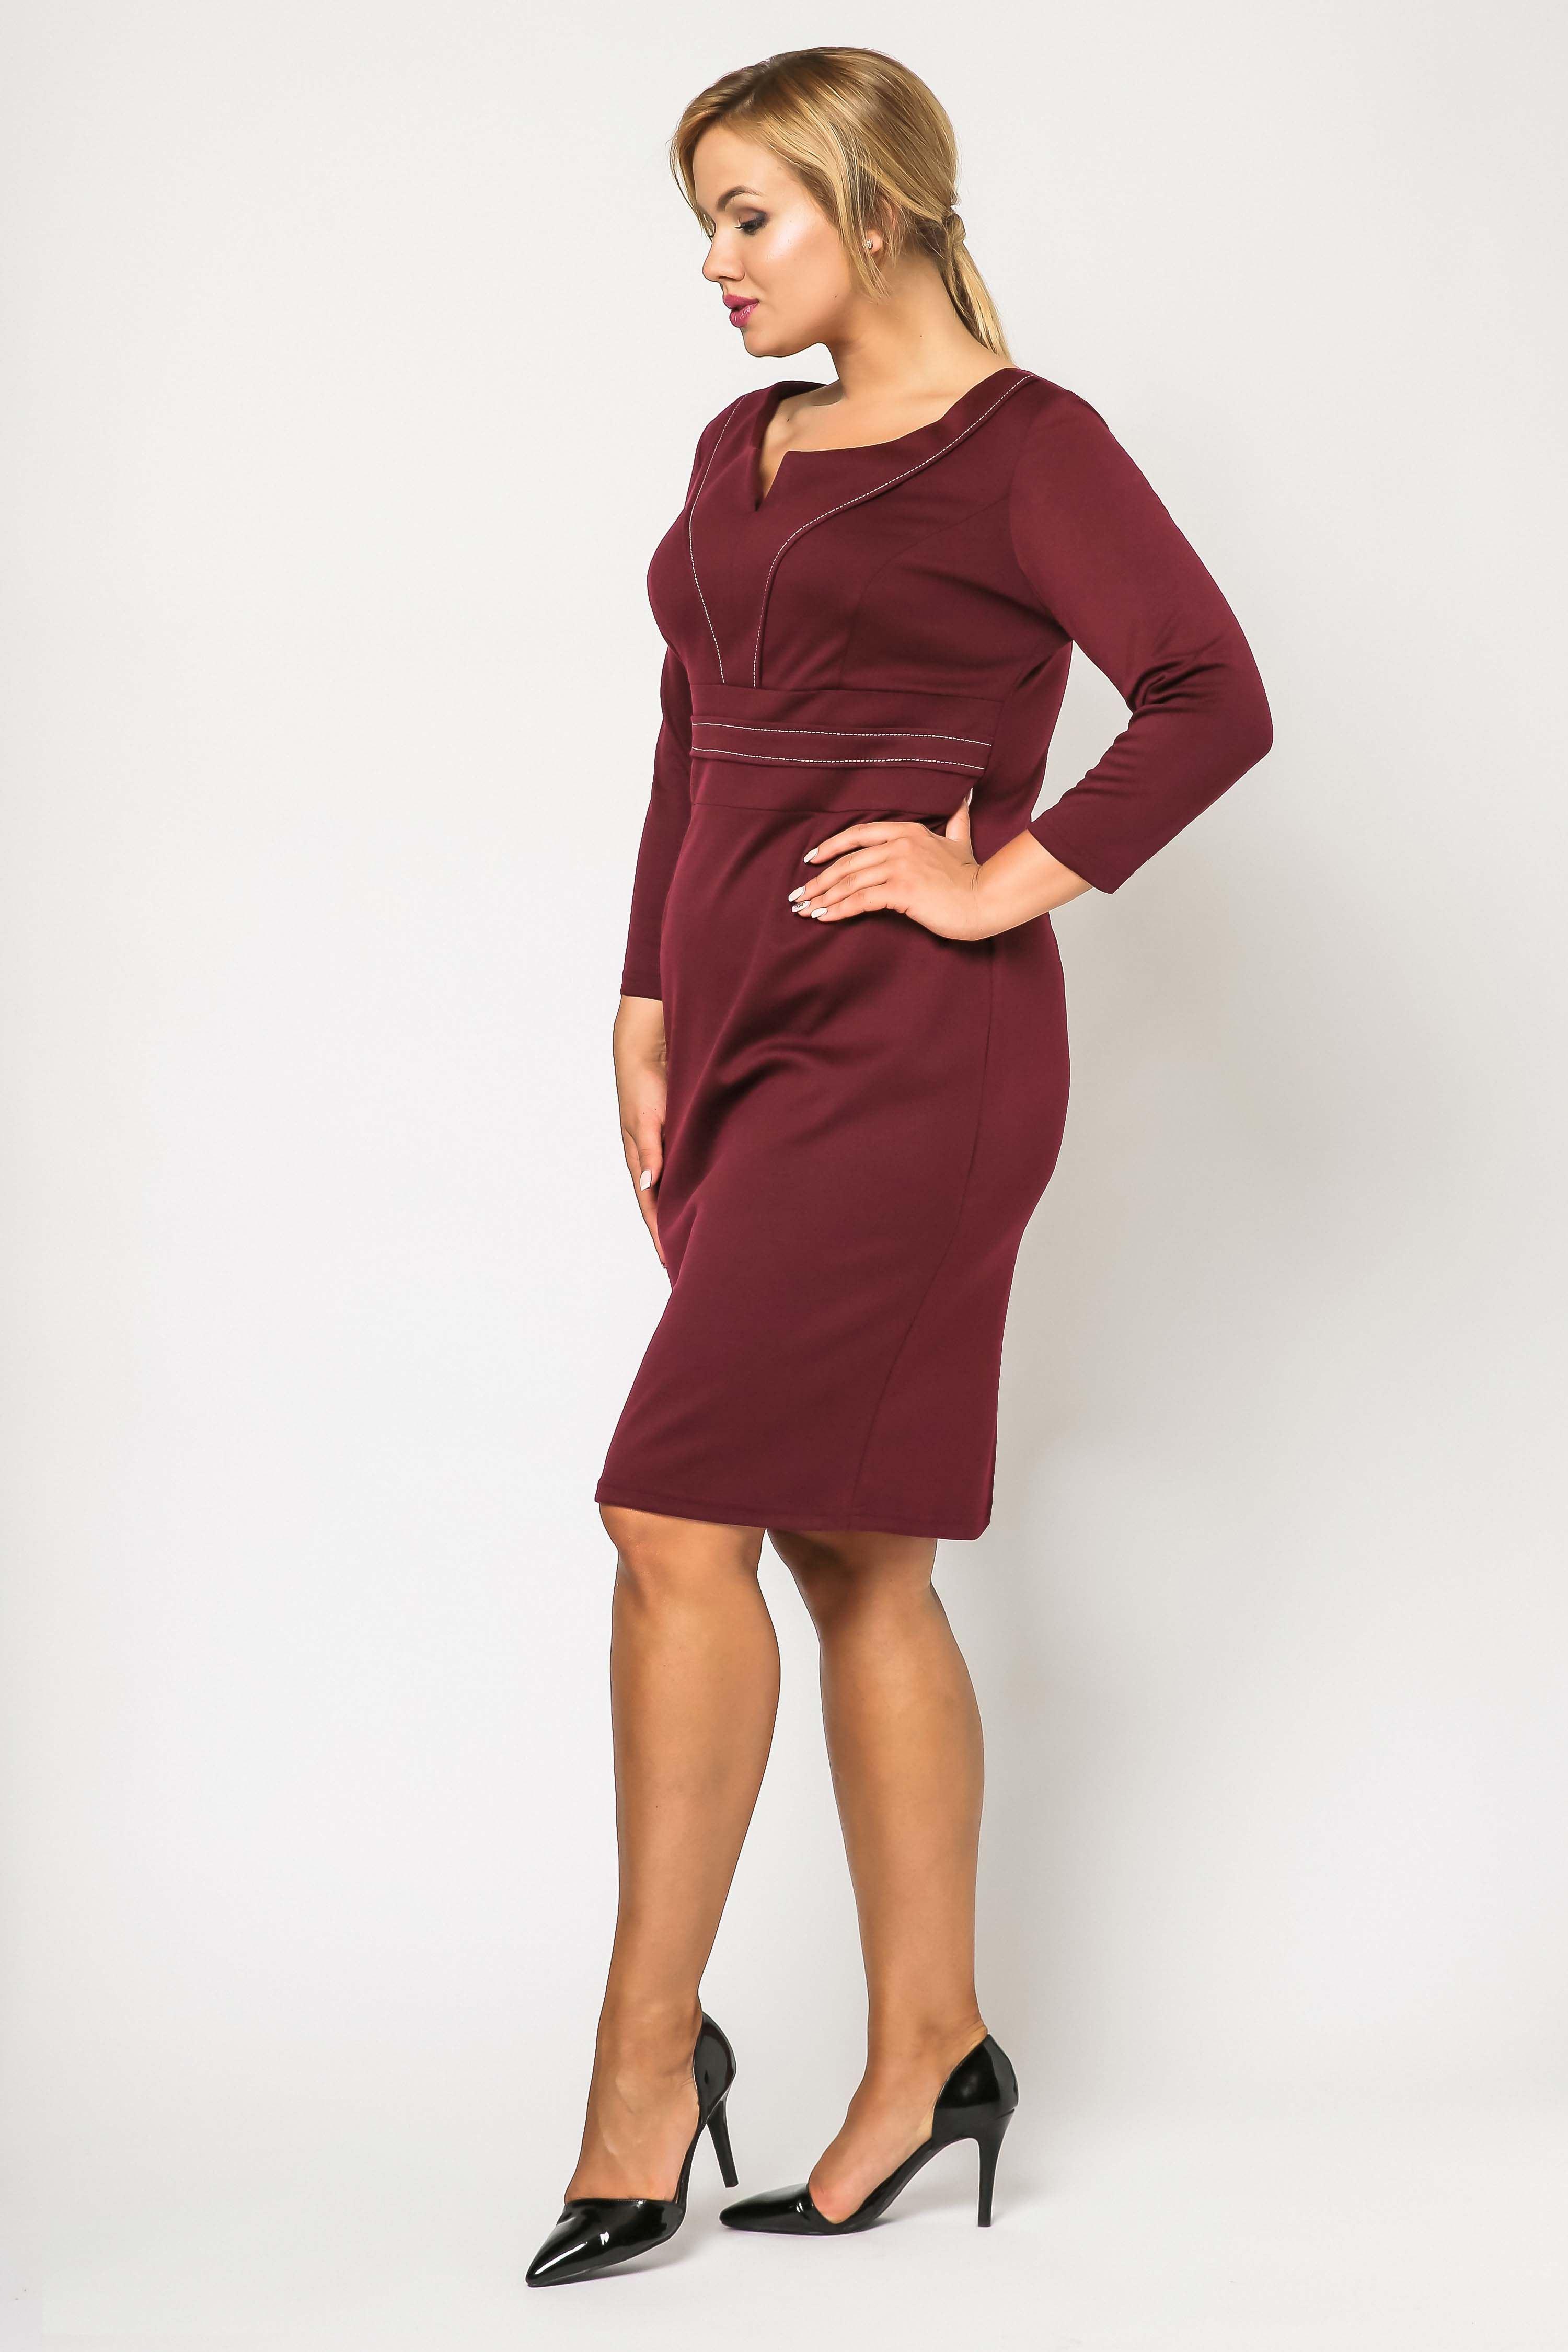 Tamara Knitwear dress, burgundy